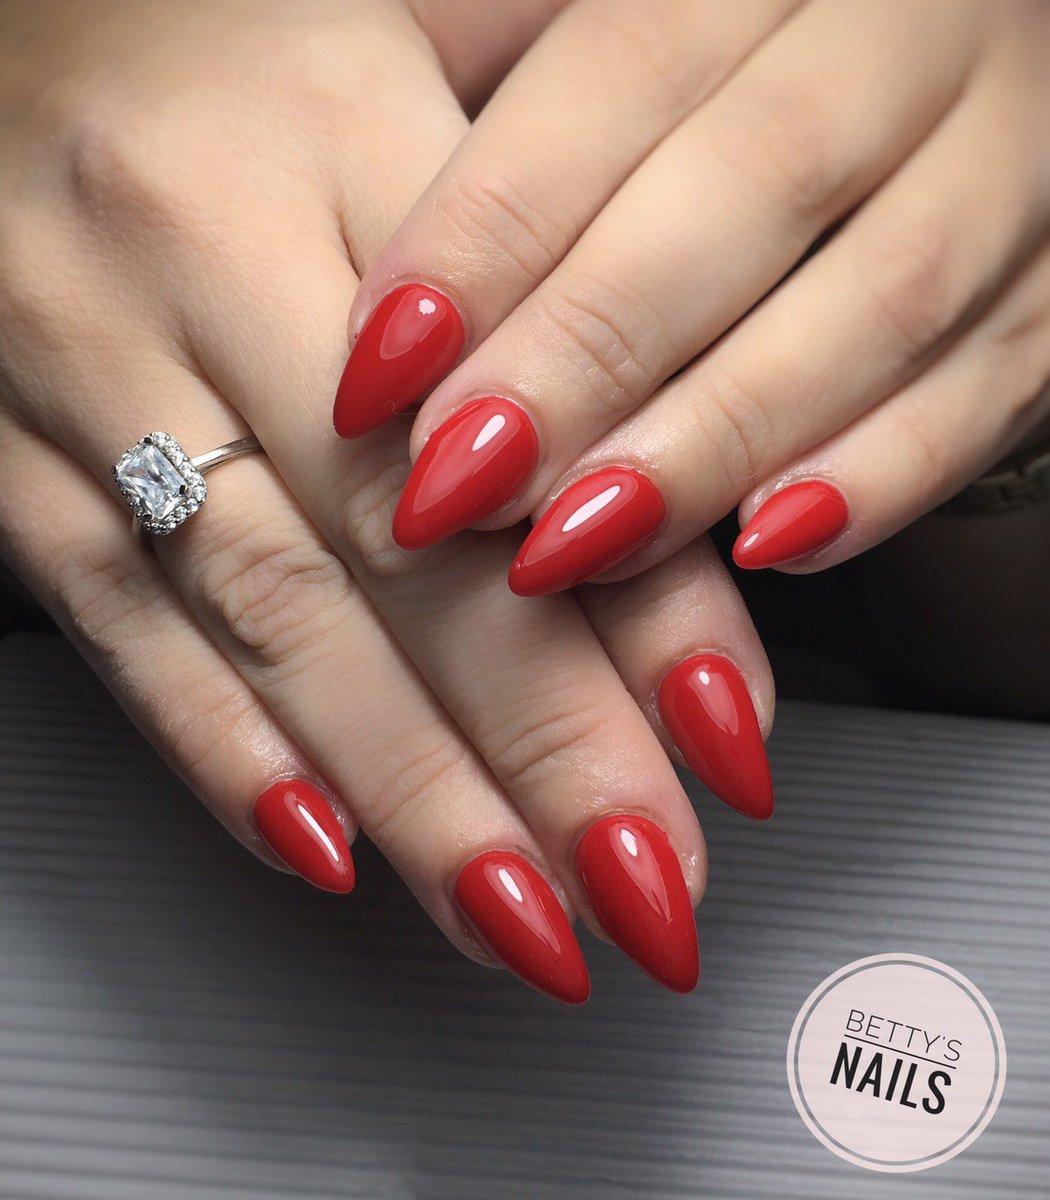 Nail Designs By Betty On Twitter Ferrari Red Nails Ferrari Fallnails Nailedit Nailart